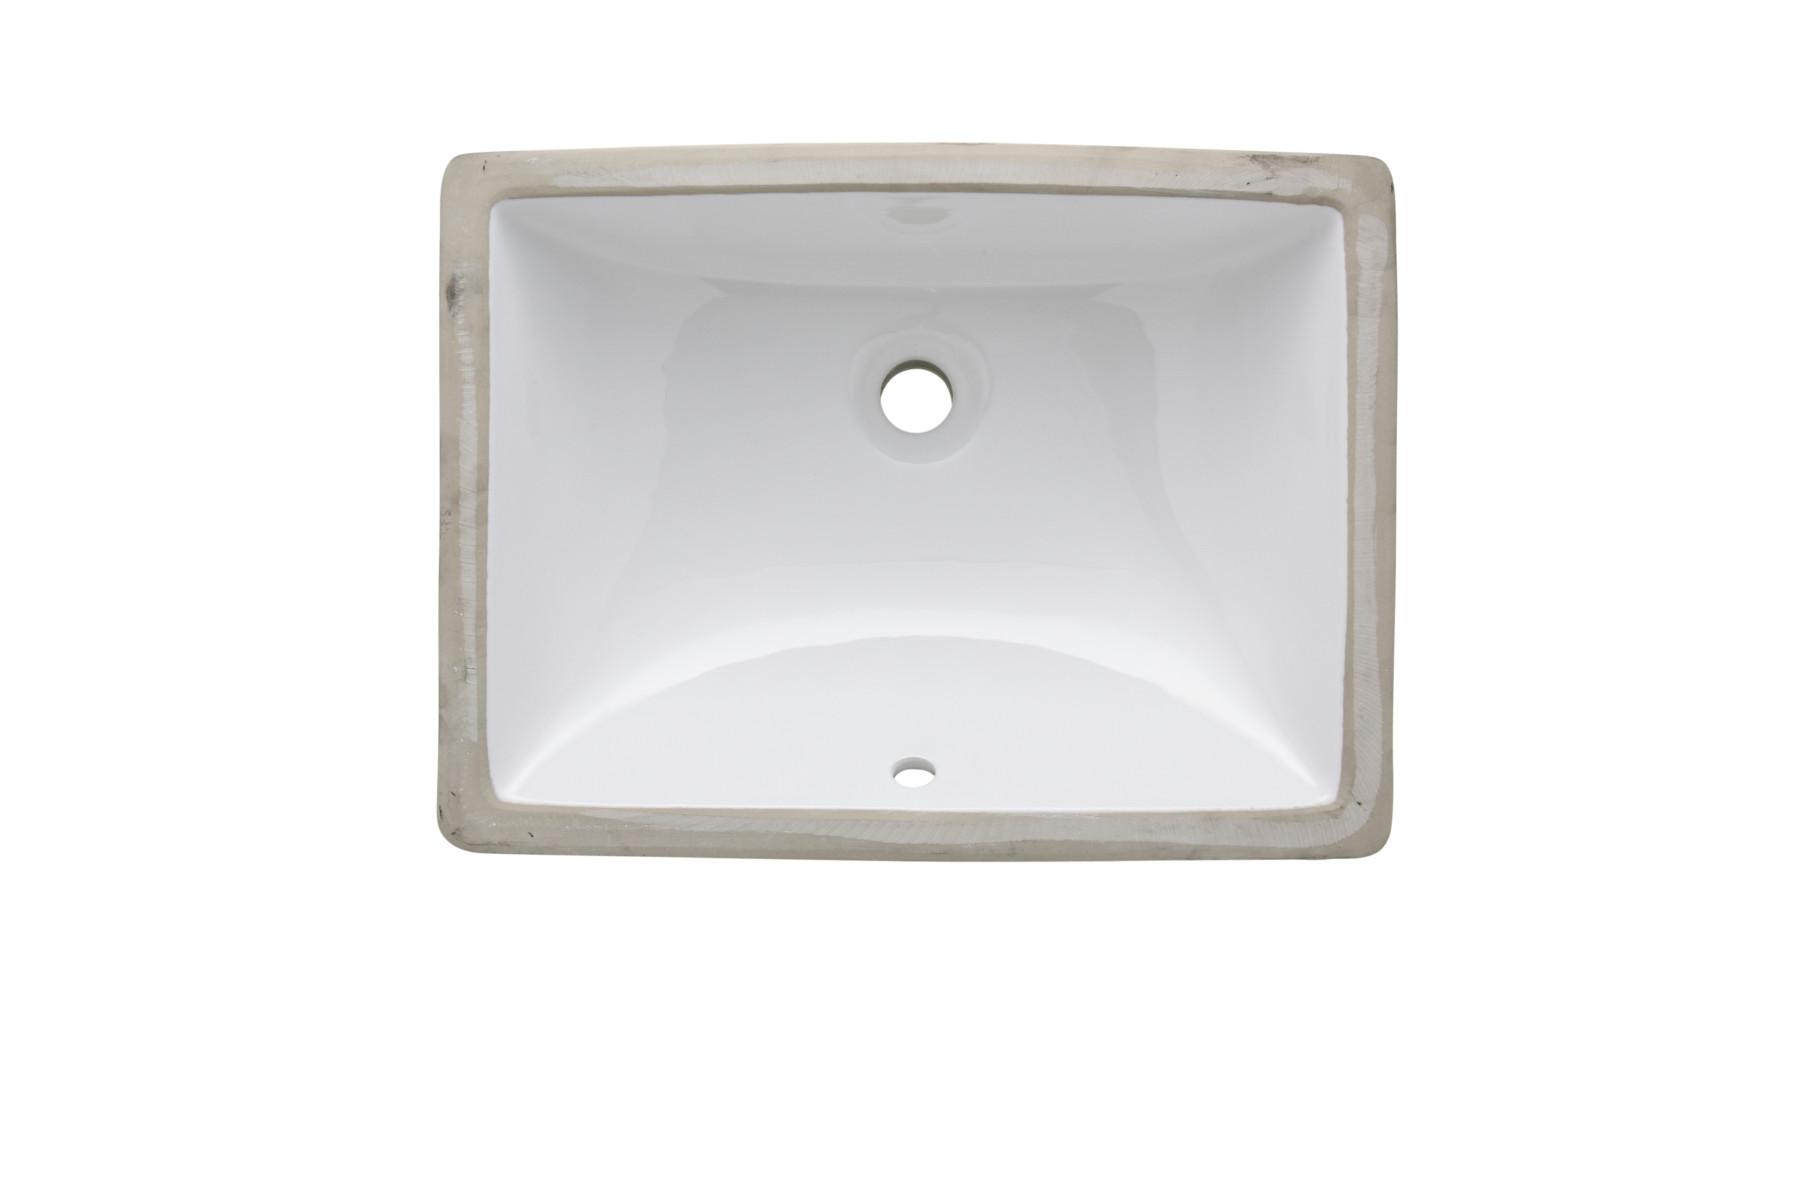 AS225 20 X 15 75 Undermount Lavatory Porcelain Sink